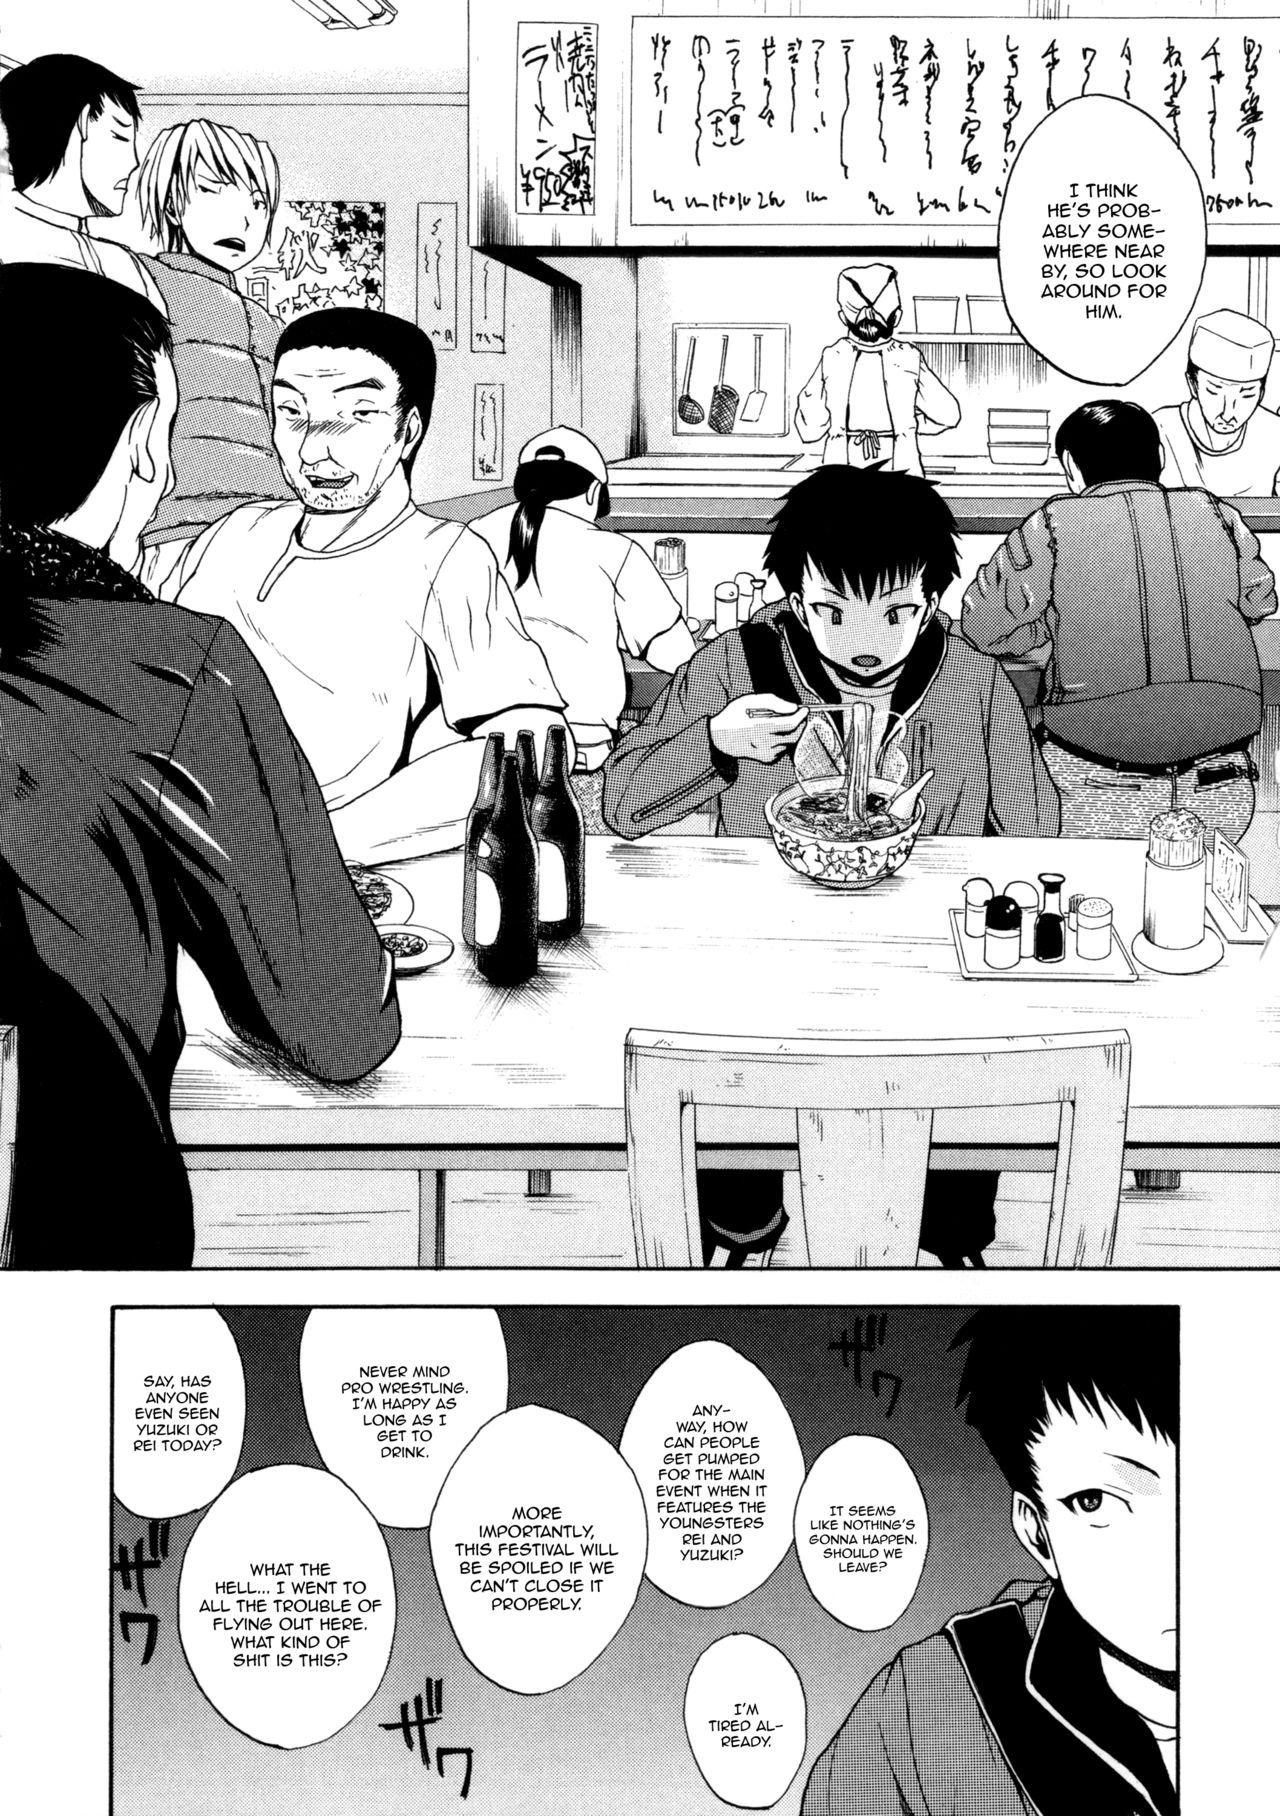 [Yoshimura Tatsumaki] Monzetsu Taigatame ~Count 3 de Ikasete Ageru~ | Faint in Agony Bodylock ~I'll make you cum on the count of 3~ [English] [Brolen] 150